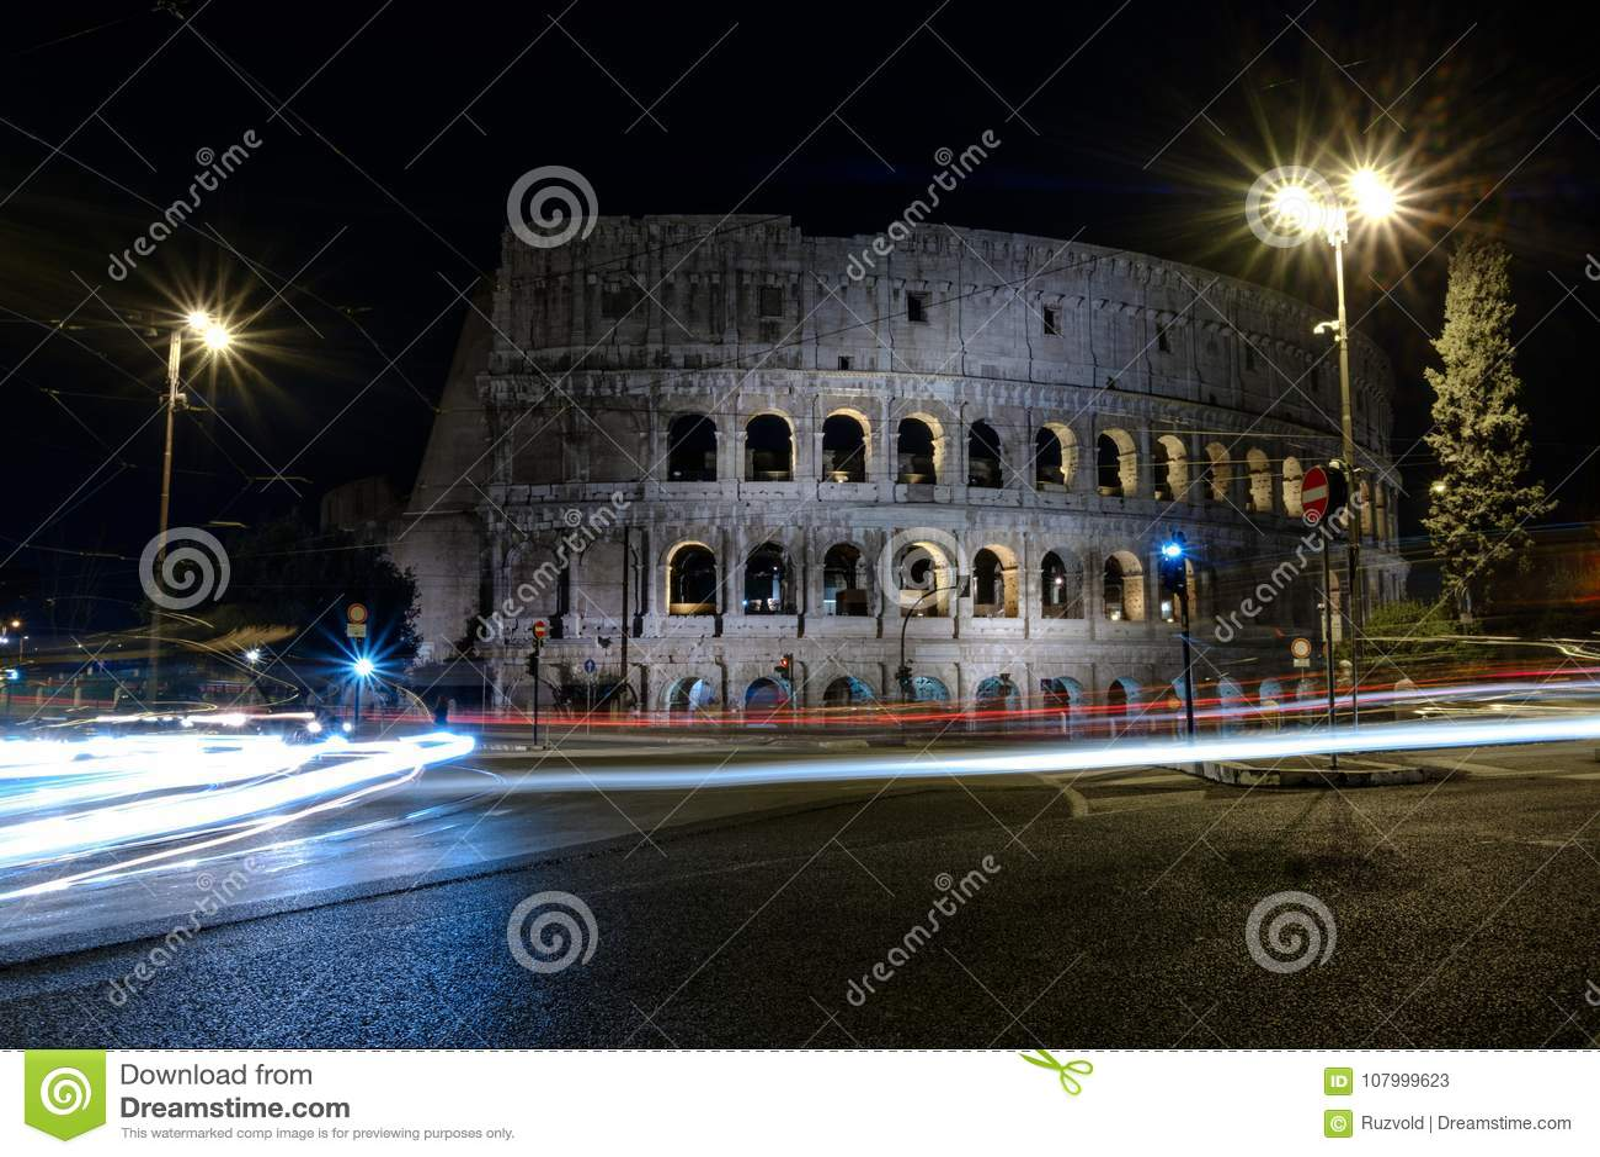 Belichtetes Colosseum in Rom nachts